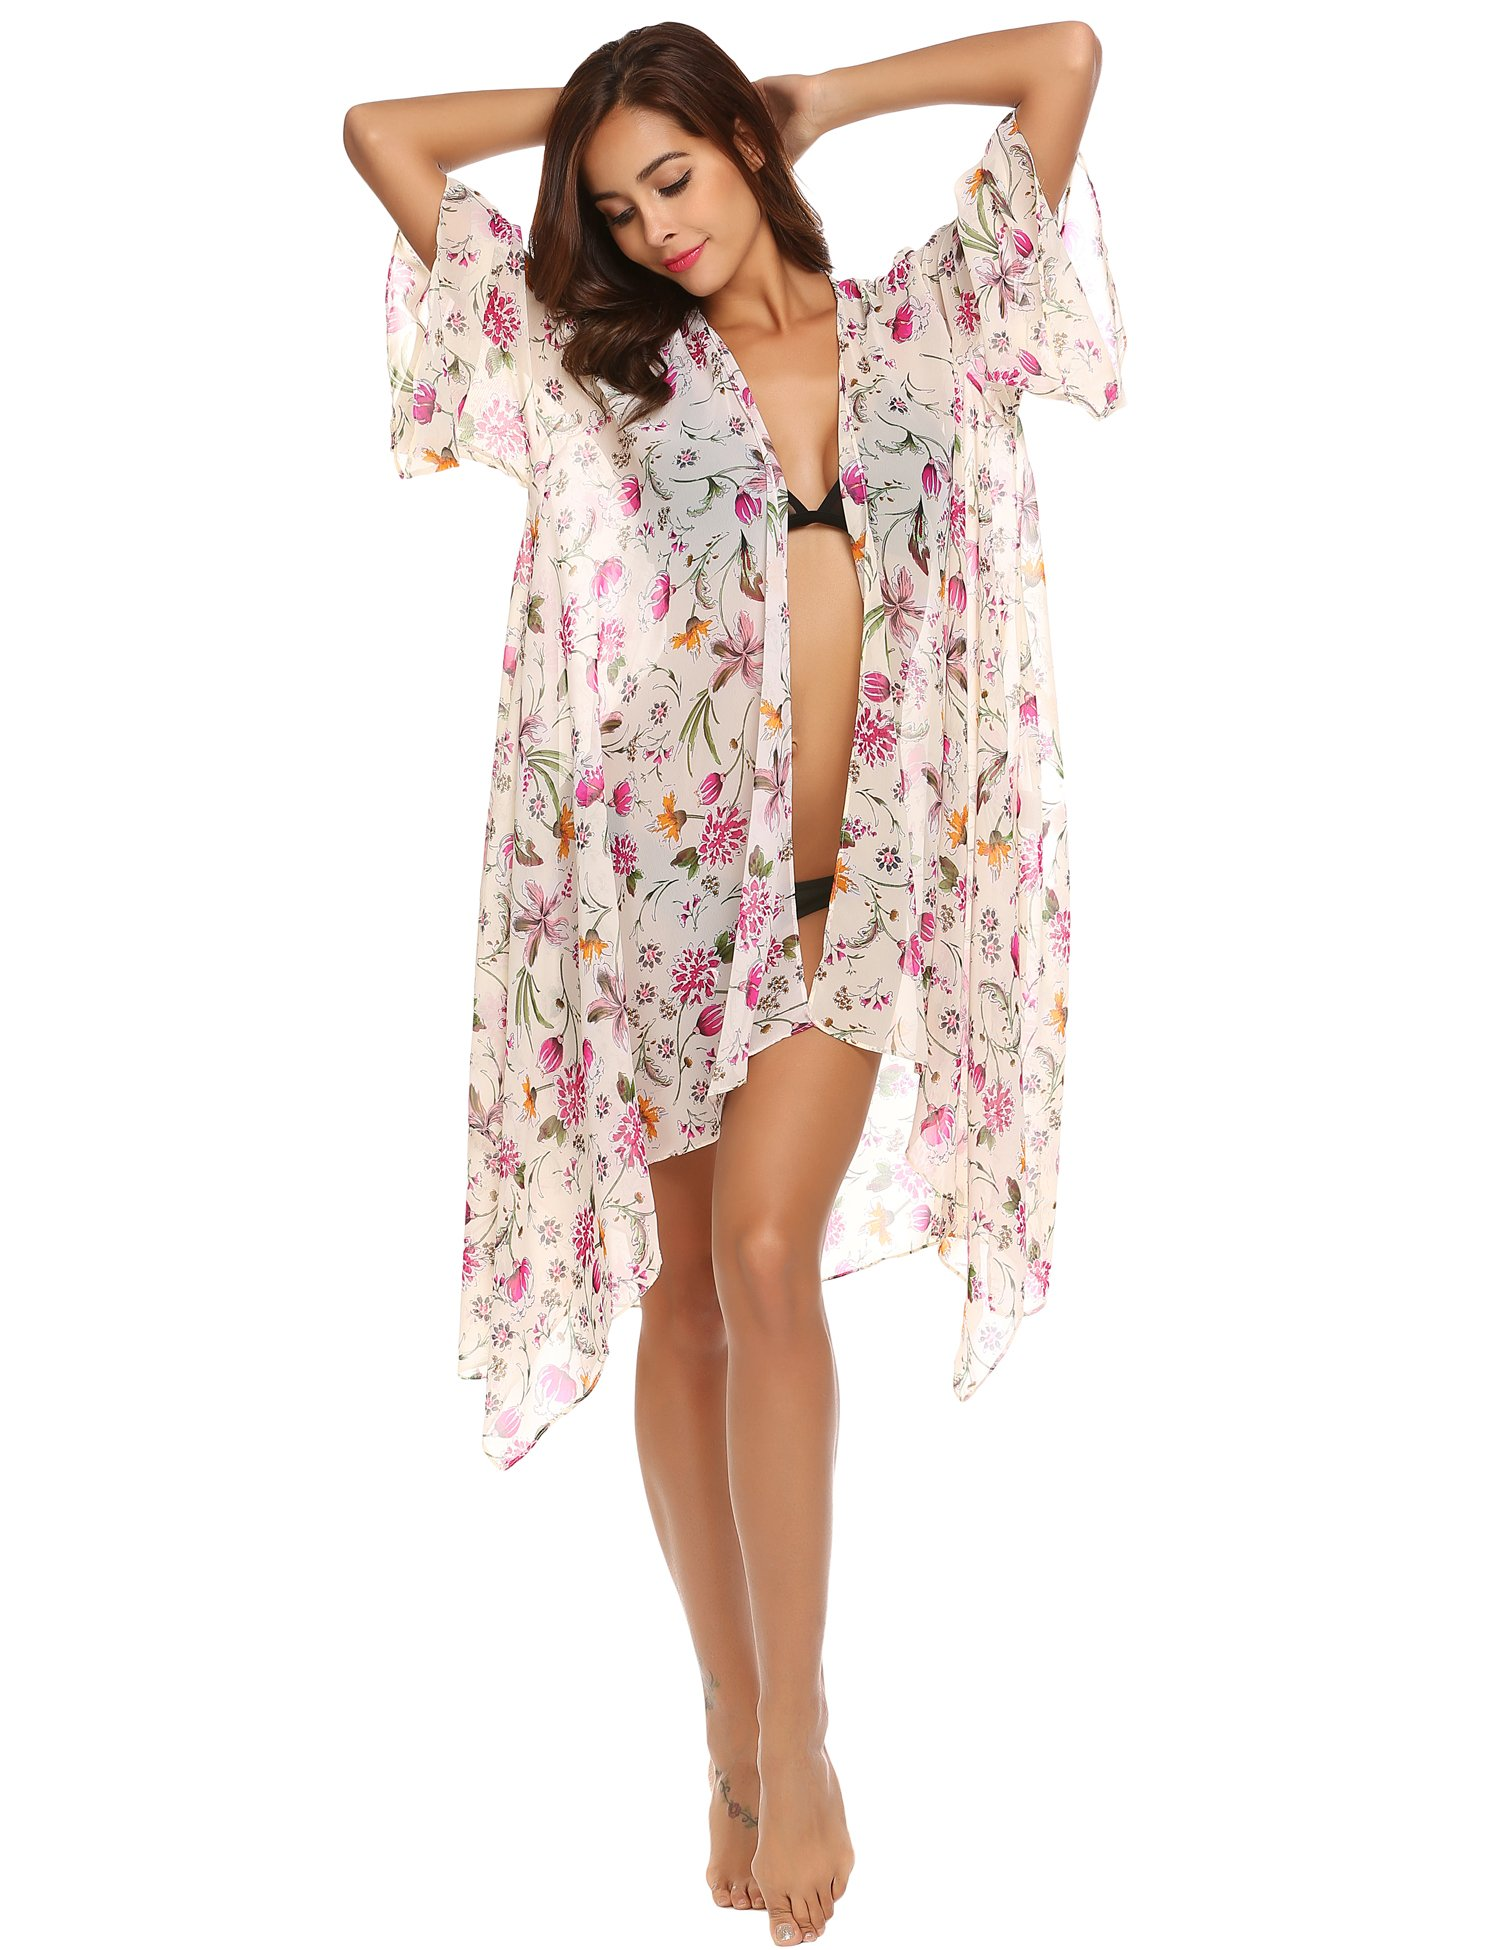 Showyoo Women's Boho Floral Print Open Front Kimono Cardigan Beachwear Cover up White XXL